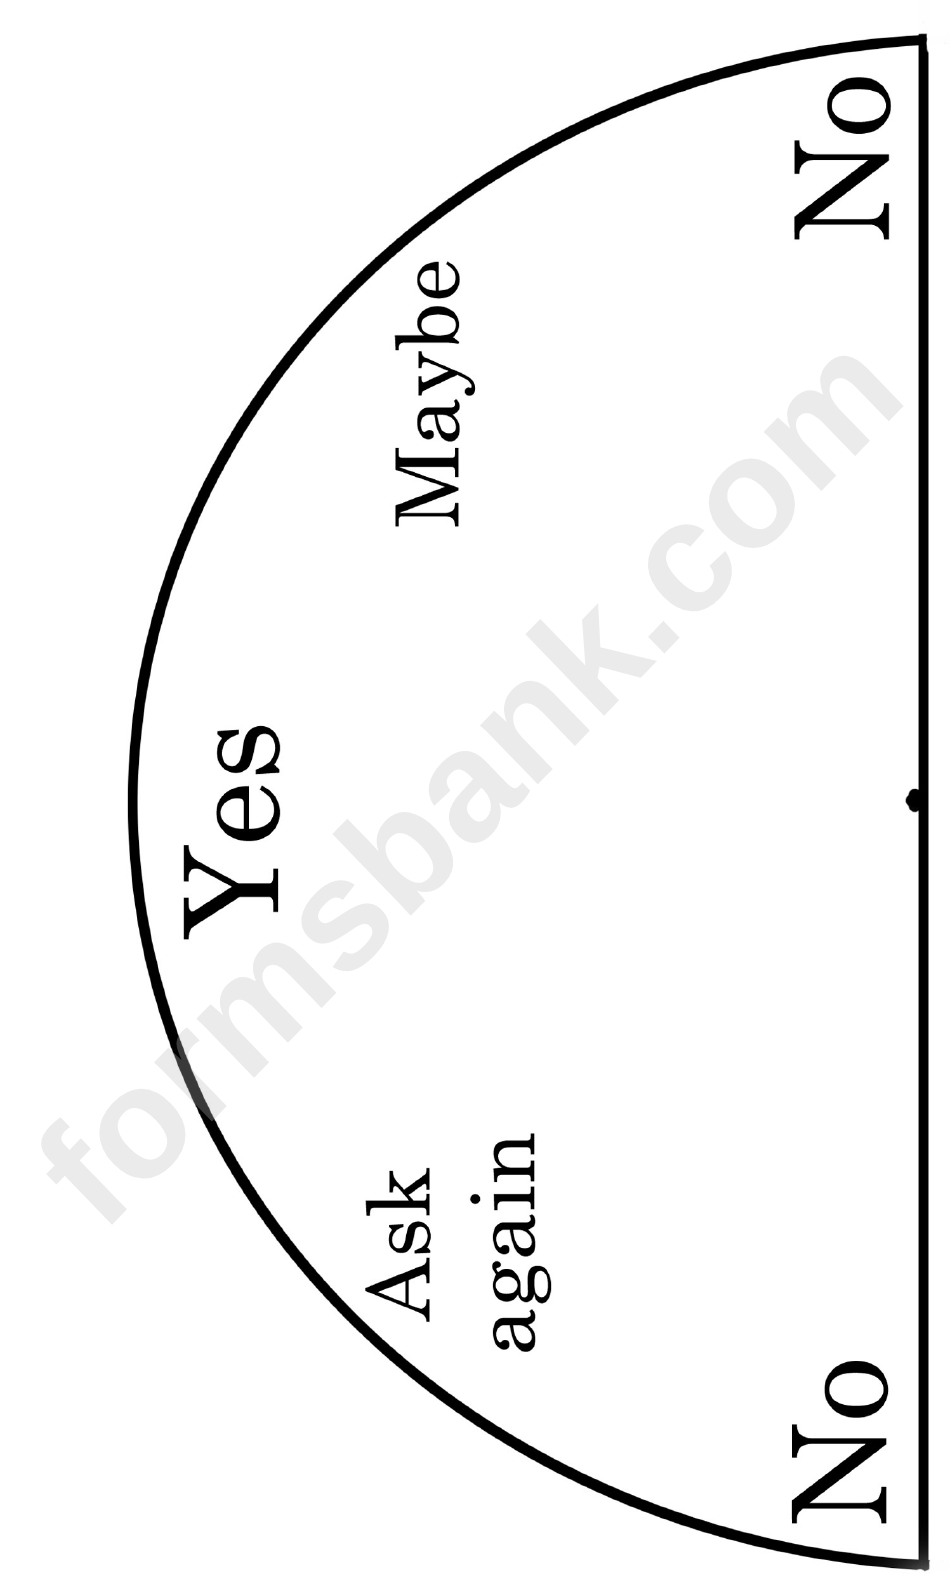 photo regarding Free Printable Pendulum Charts named Certainly Or No Pendulum Chart printable pdf down load